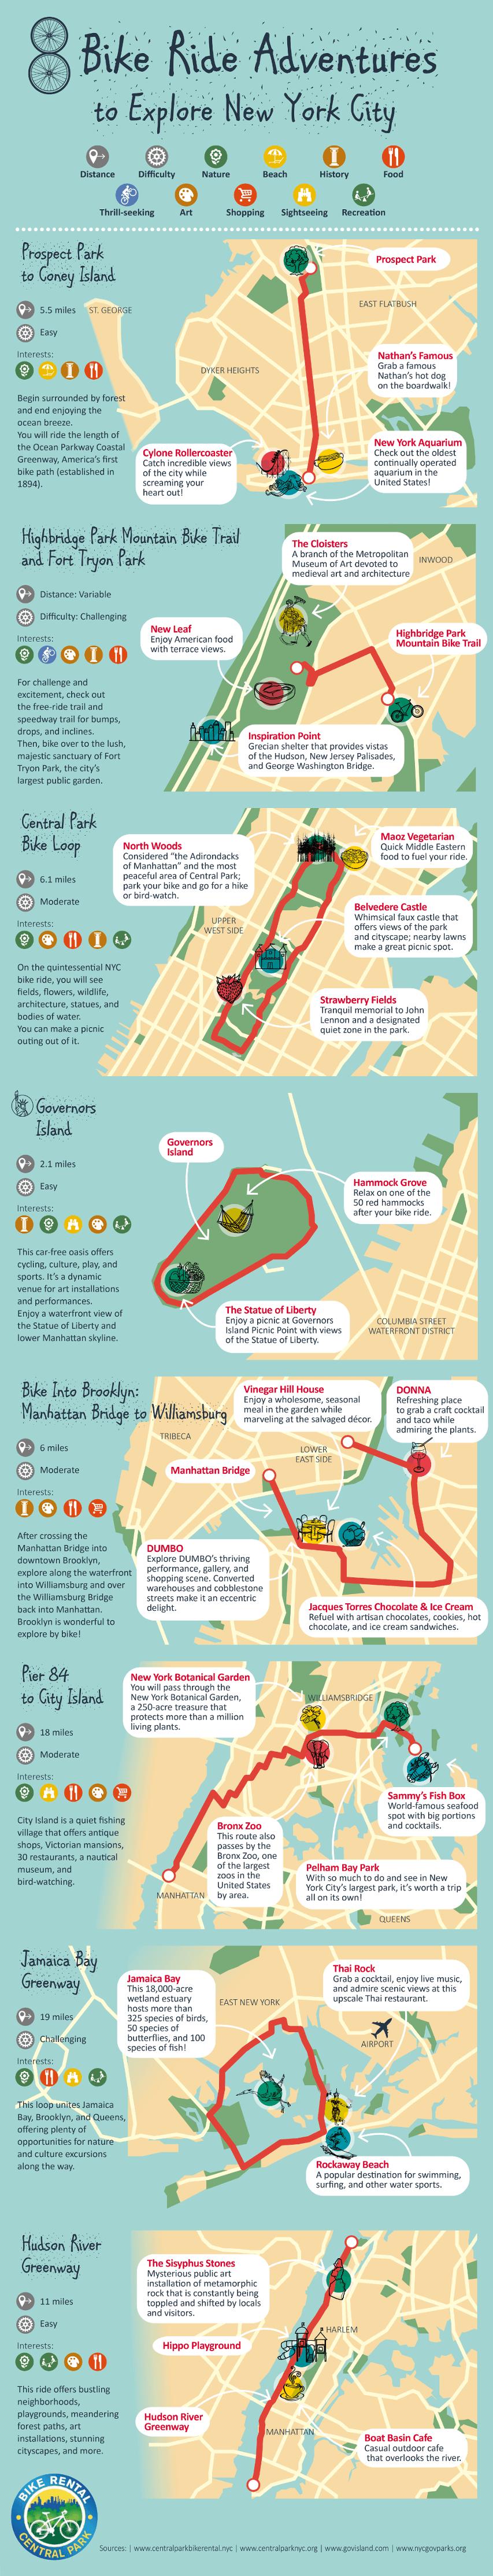 Bike Ride Adventures to Explore New York City - CentralParkBikeRental.nyc - Infographic